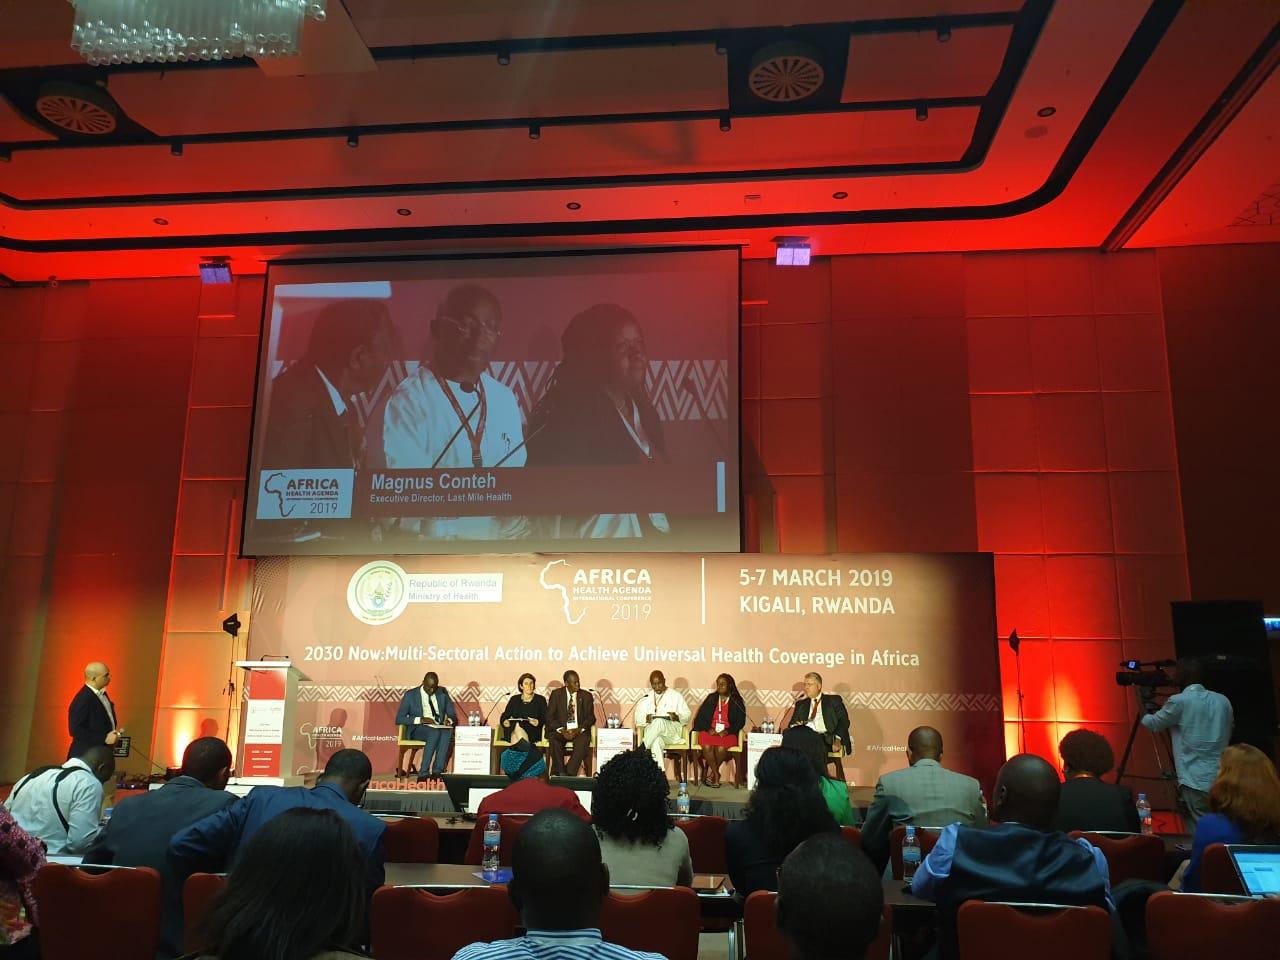 Africa Health Agenda International Conference 2019 [Photo